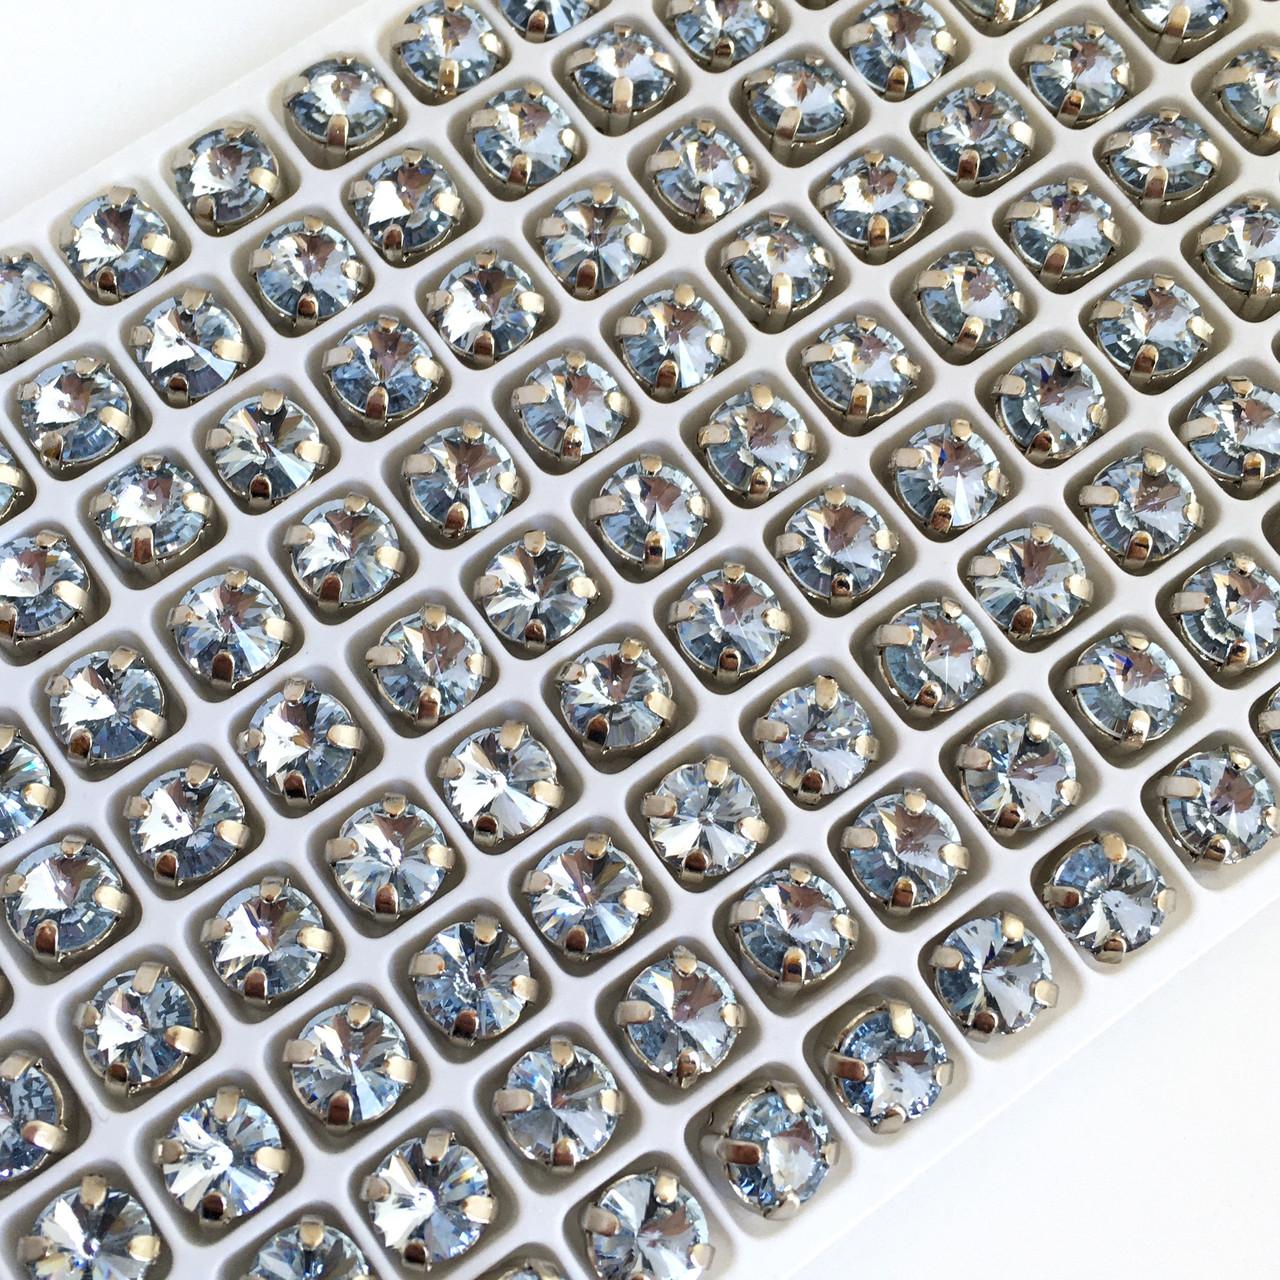 Риволи 6 мм (LUX). Аквамарин. Оправа (под серебро). Цена за 1 шт